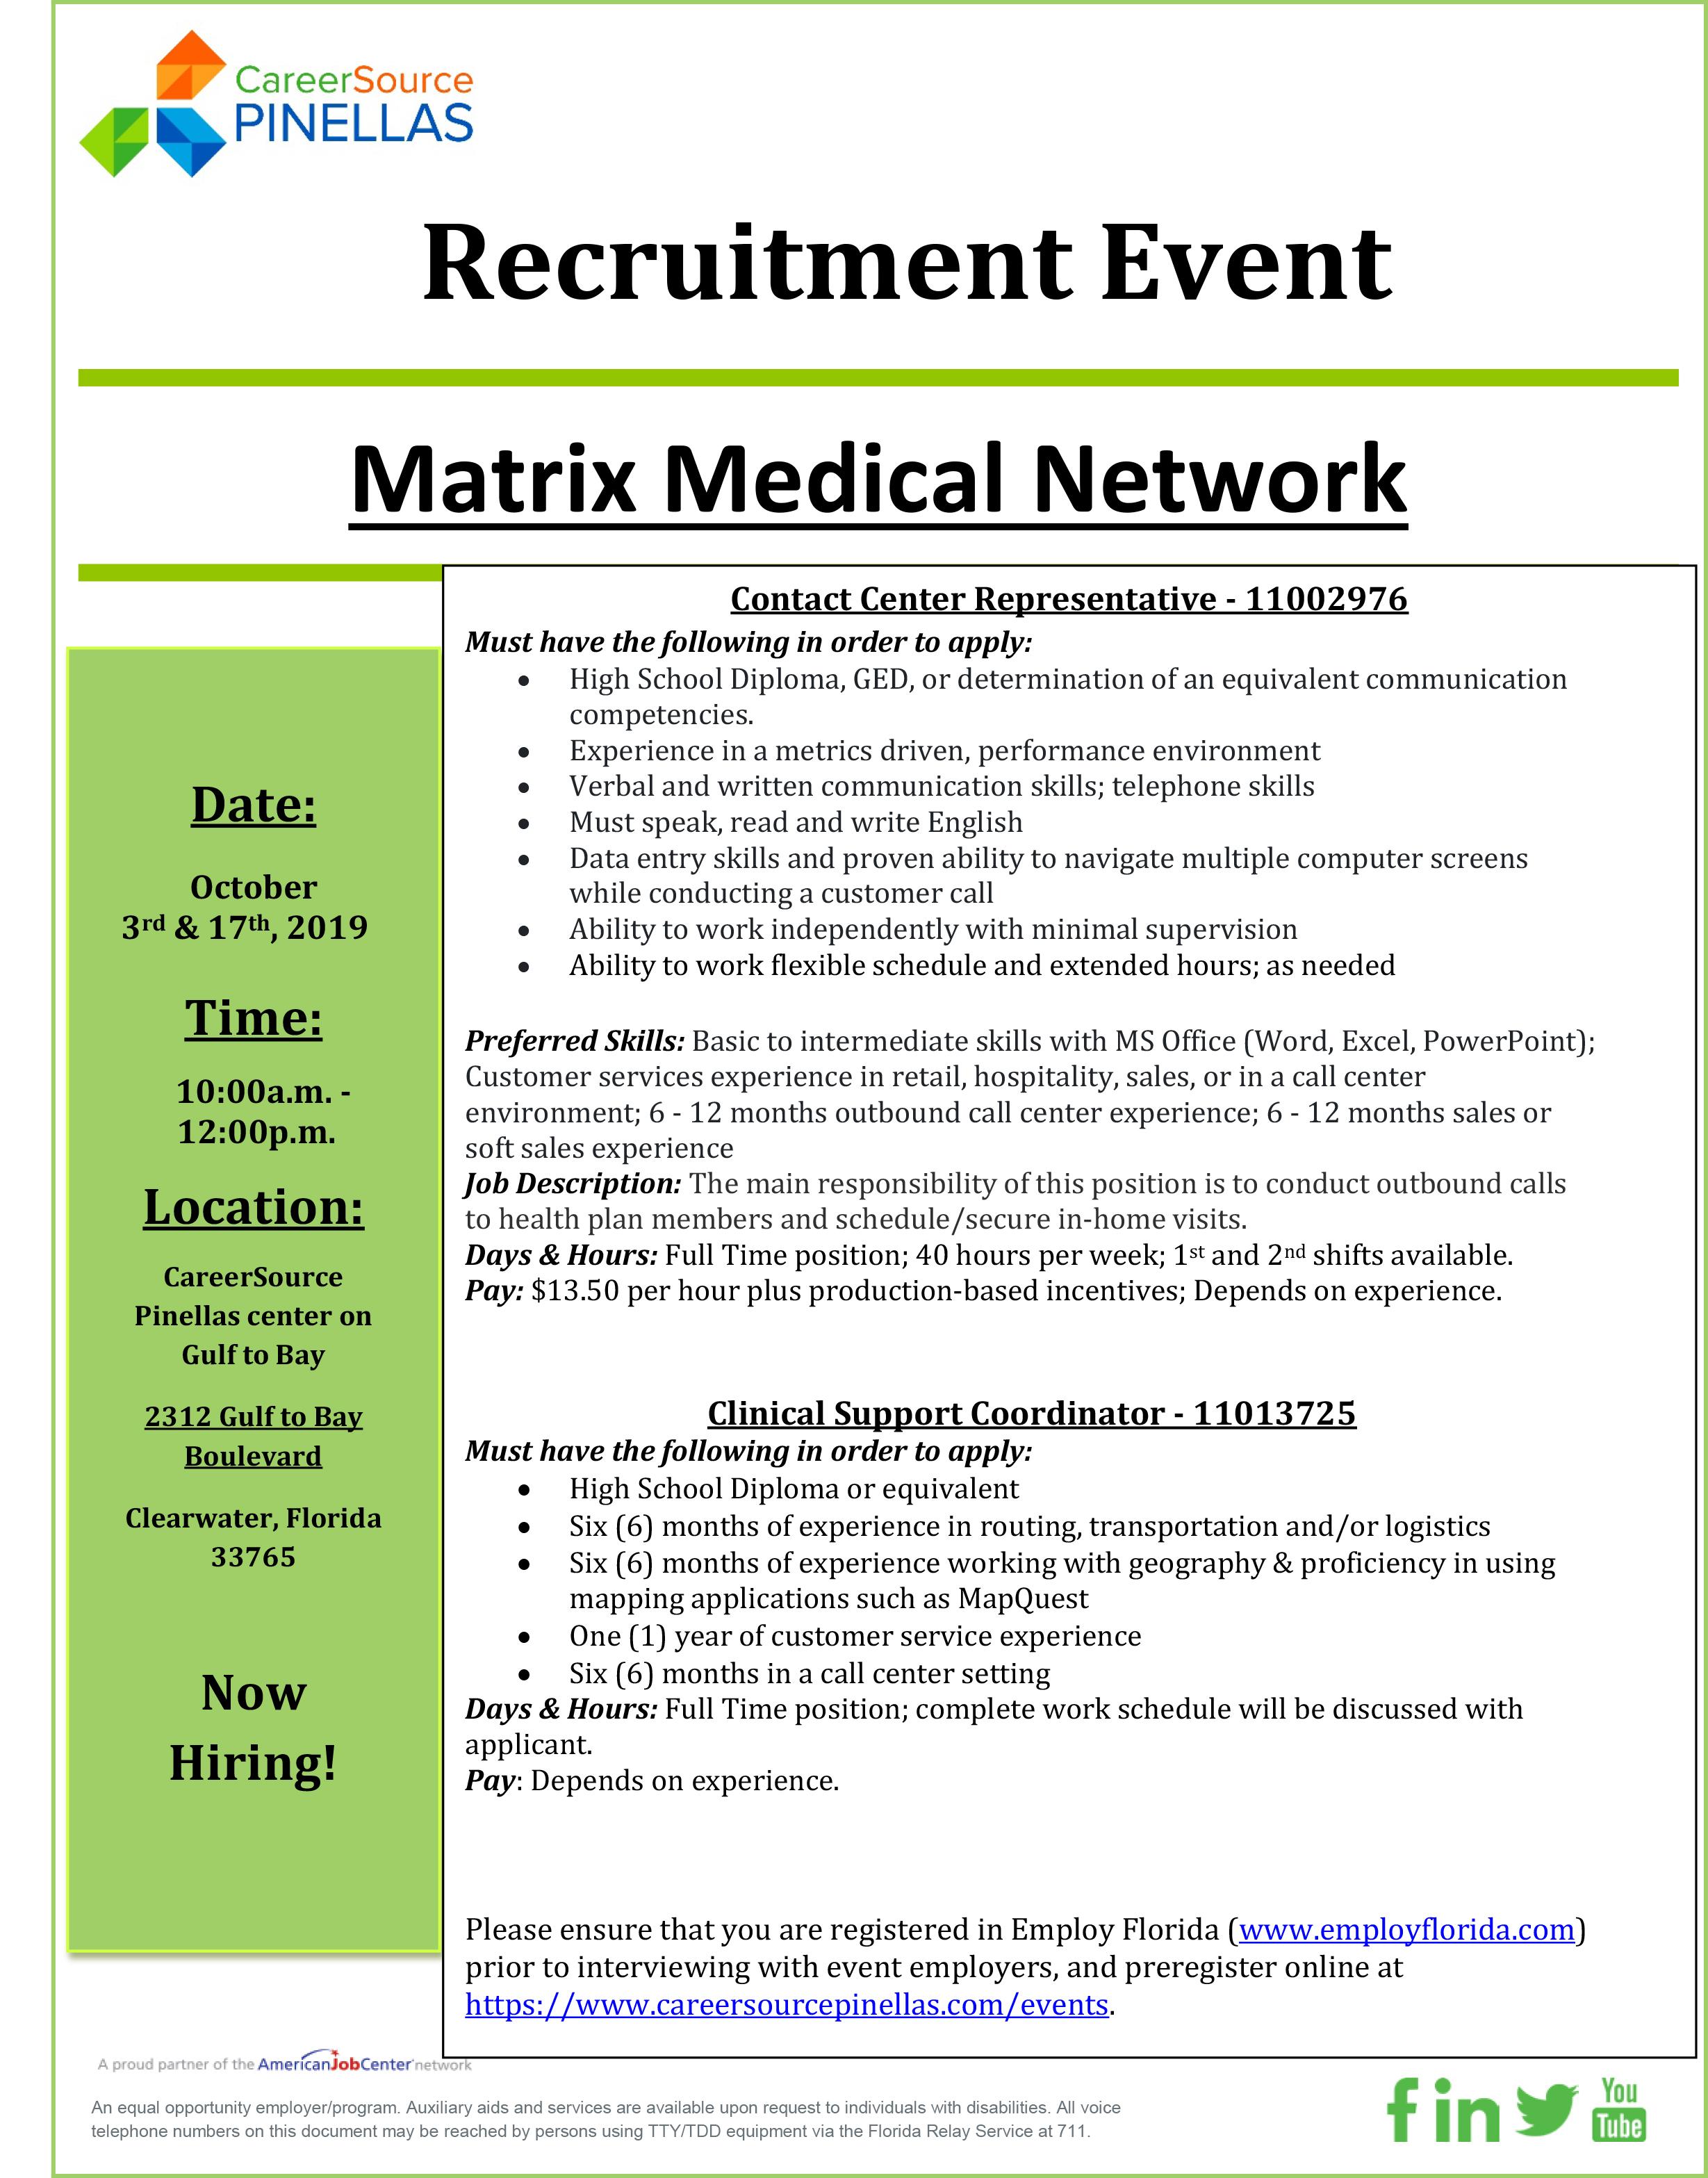 Matrix Medical On-Site 10.3 & 10.17.2019rep.jpg